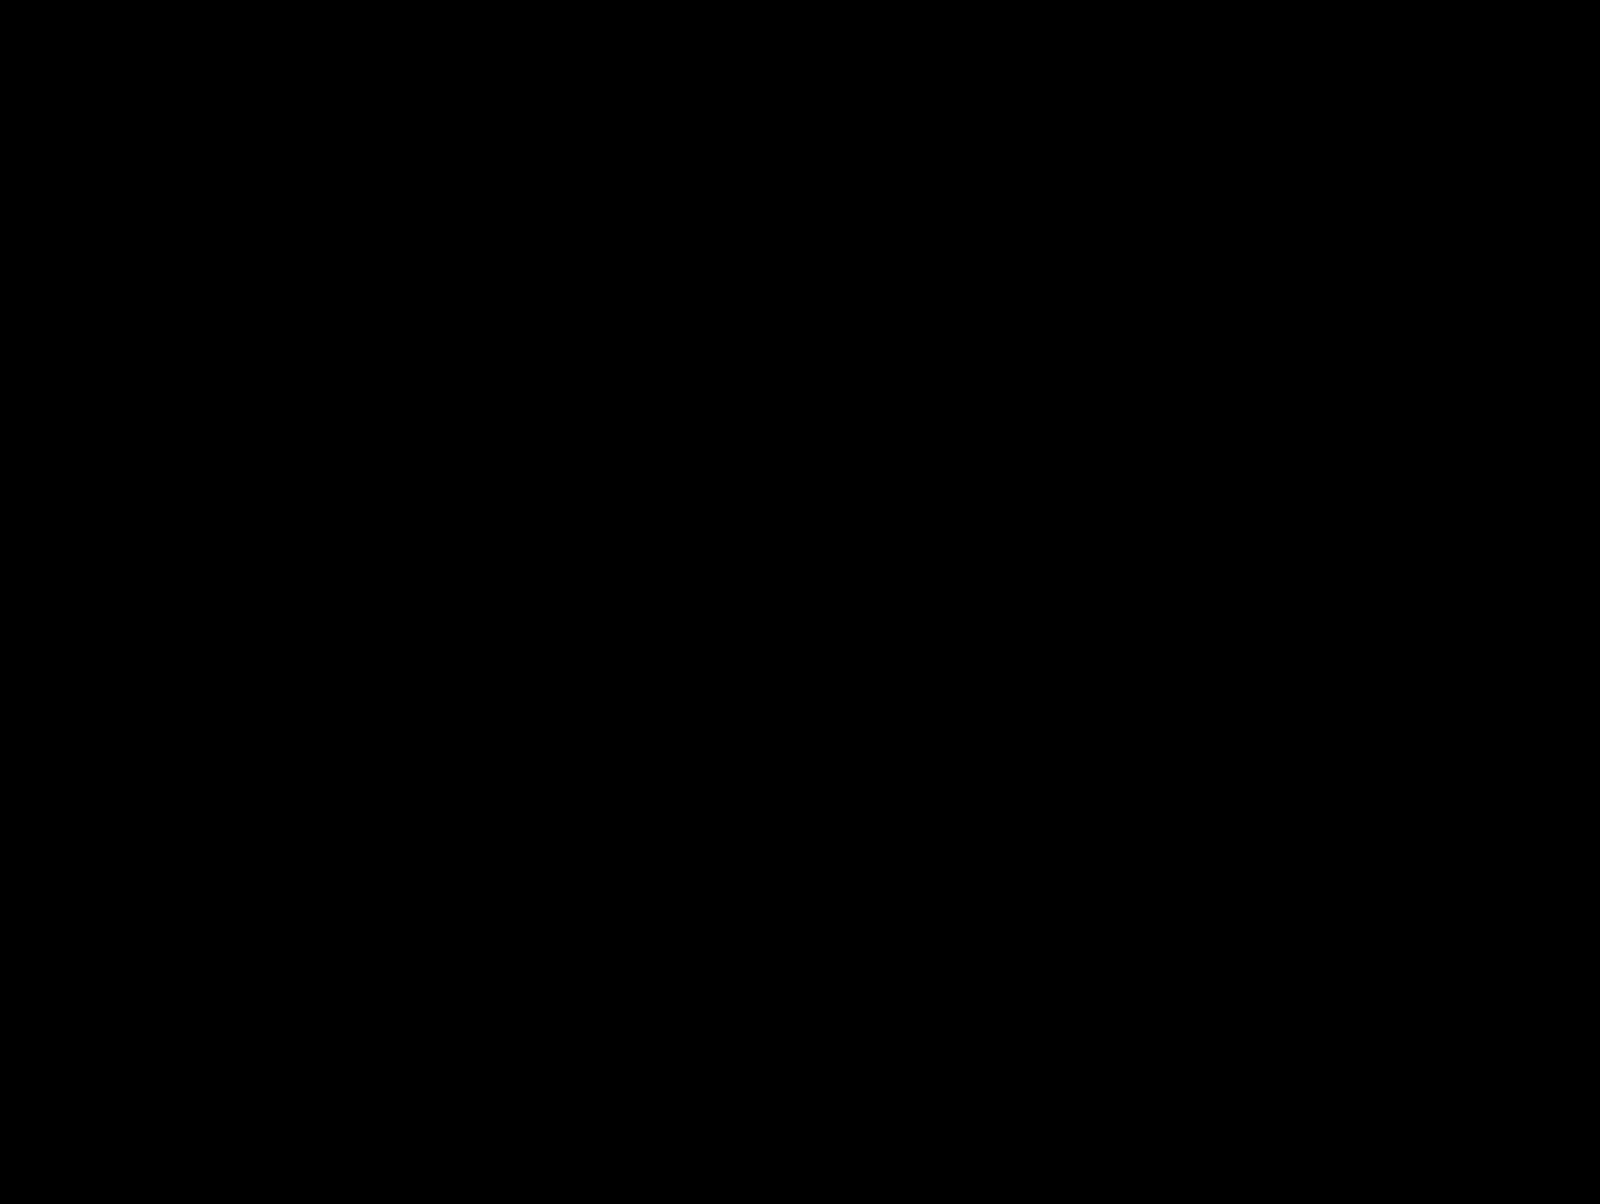 Crow PNG - 10322